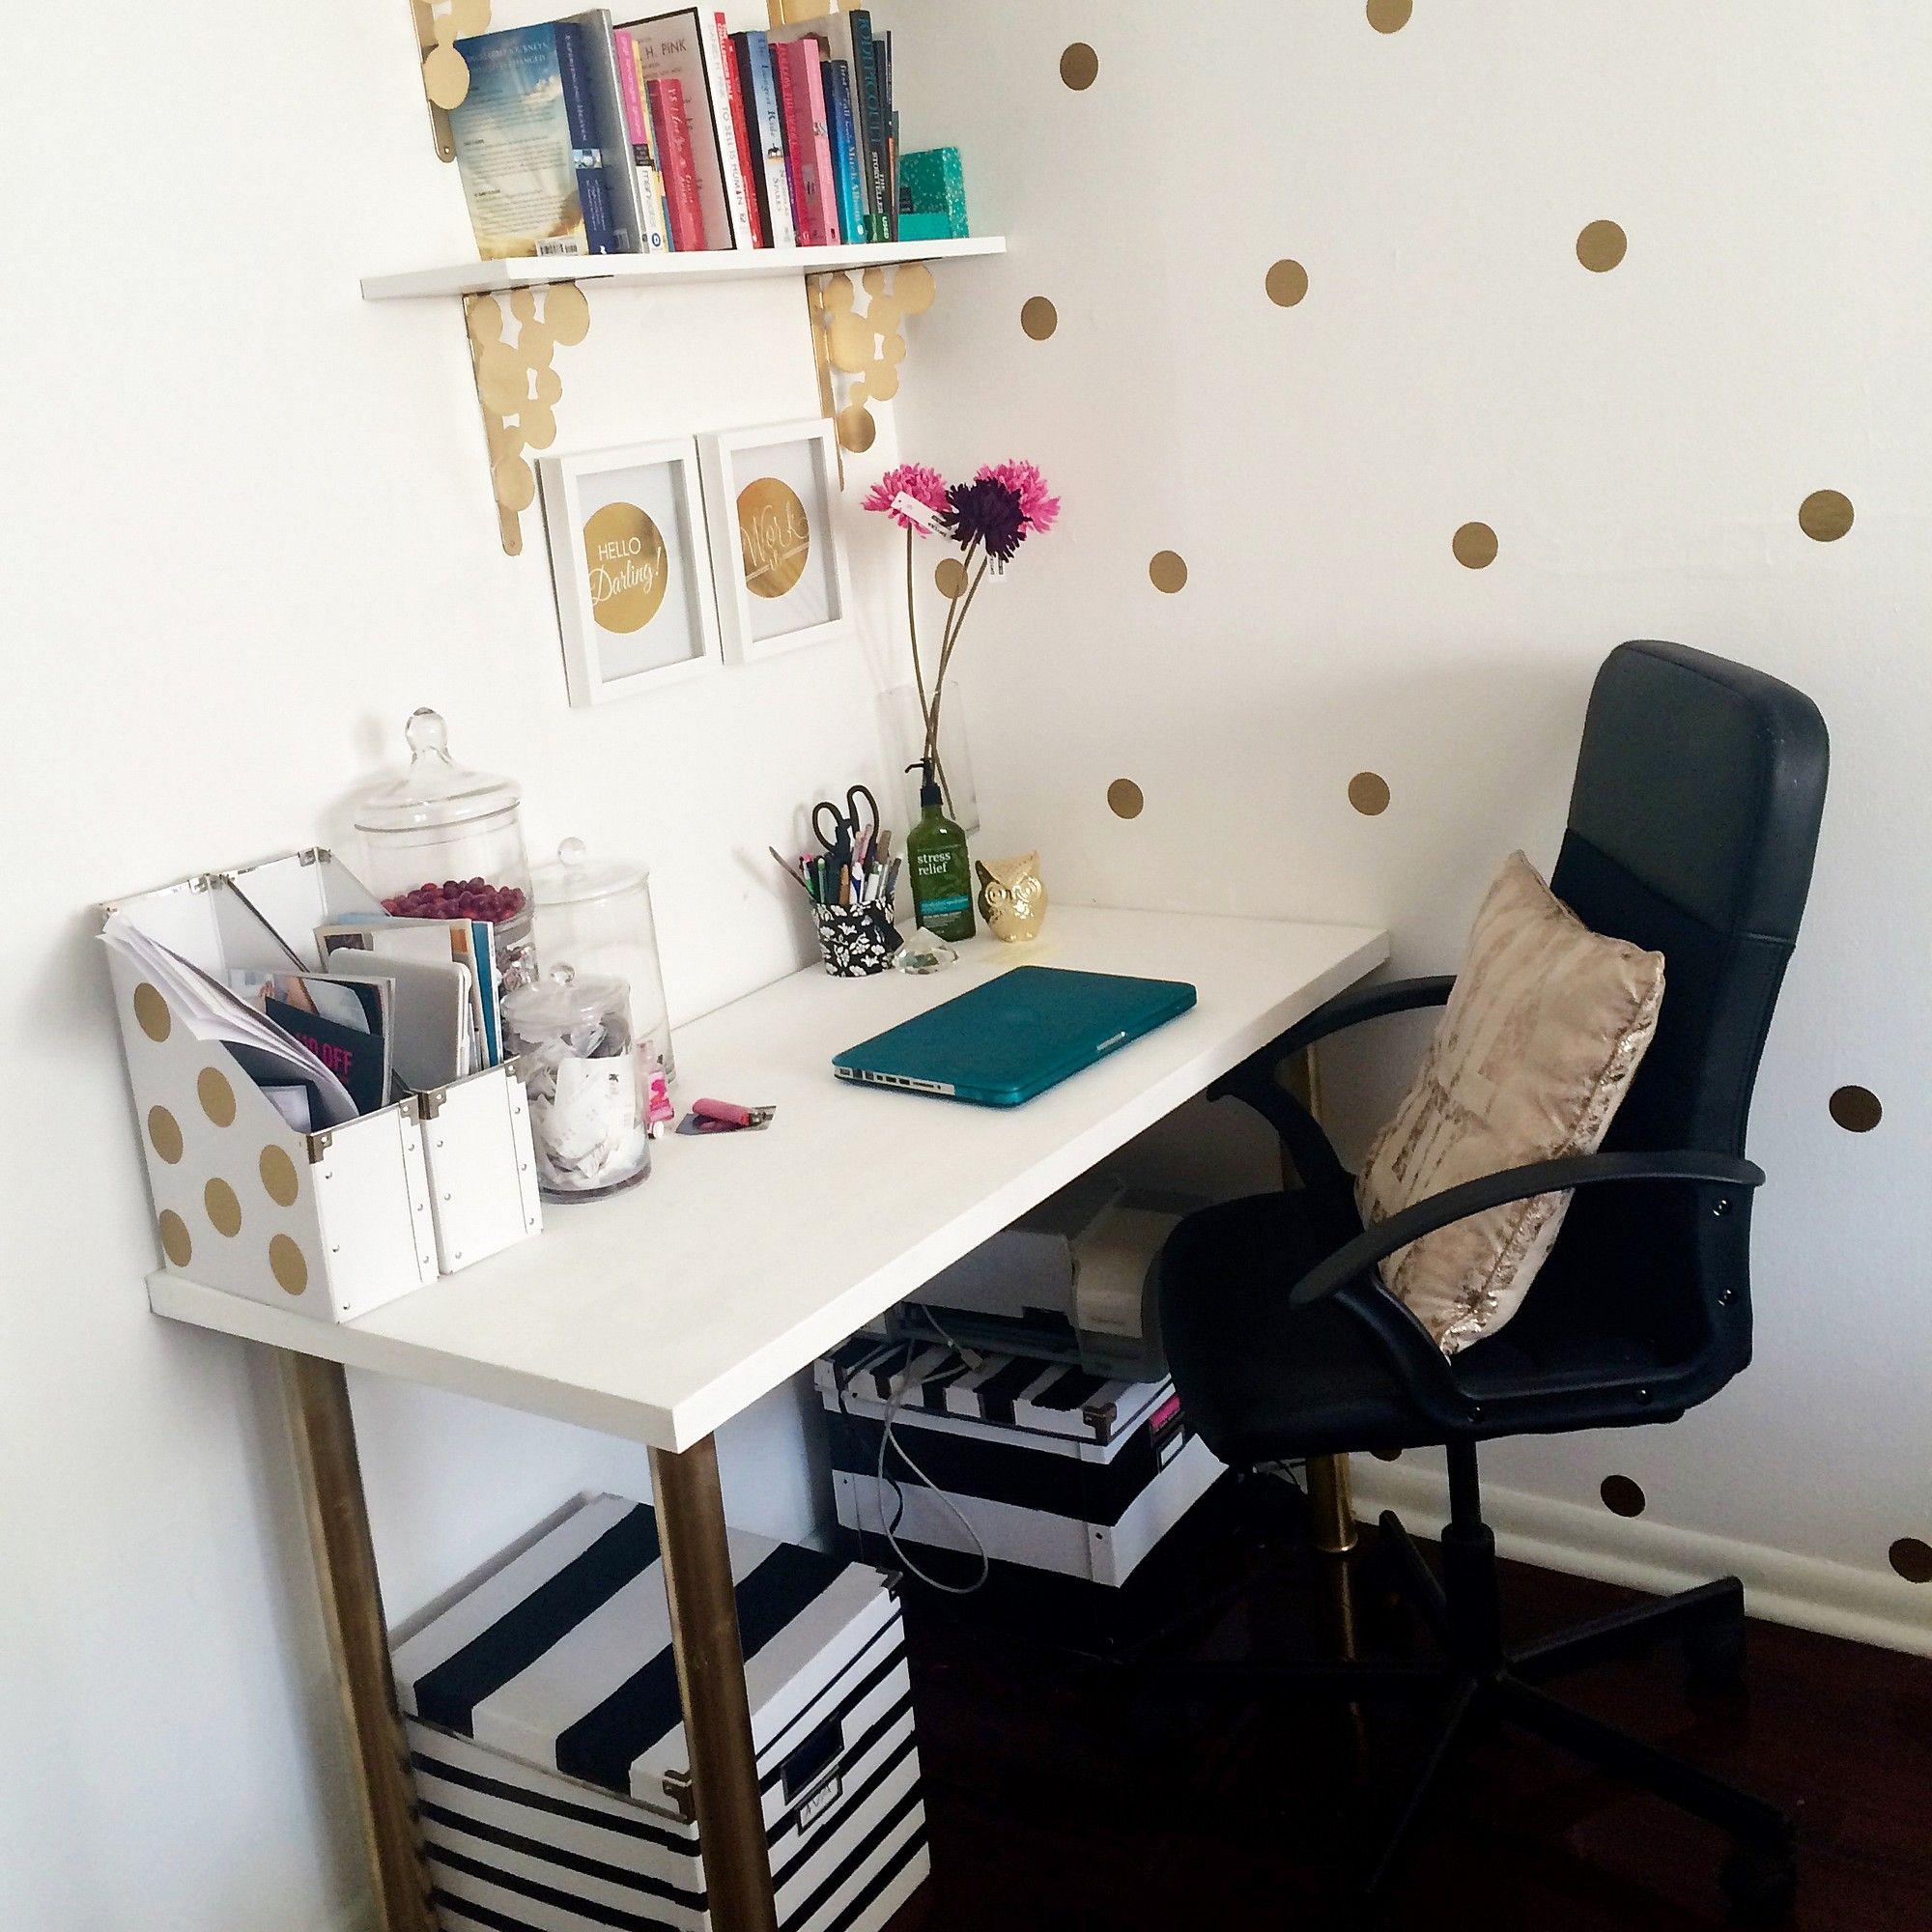 LINNMON ADILS IKEA White Table Corner Desk Decor